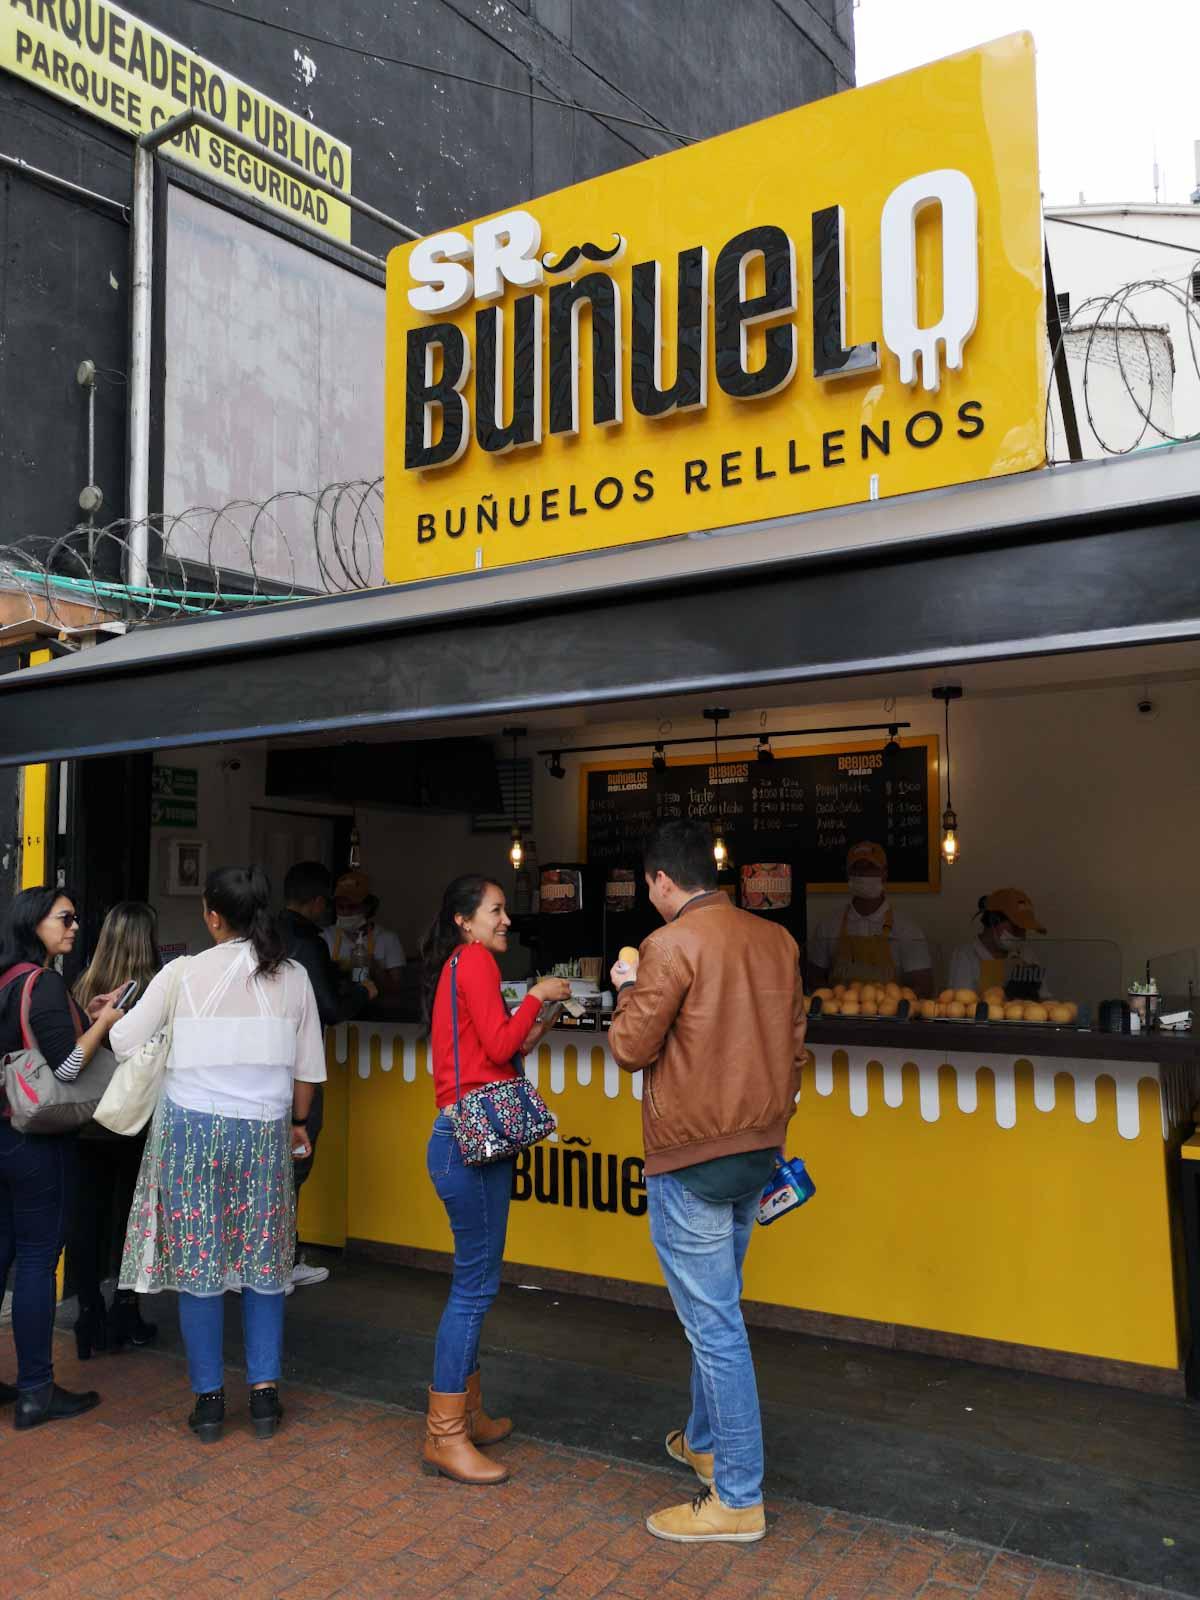 Bunuelo Bogota